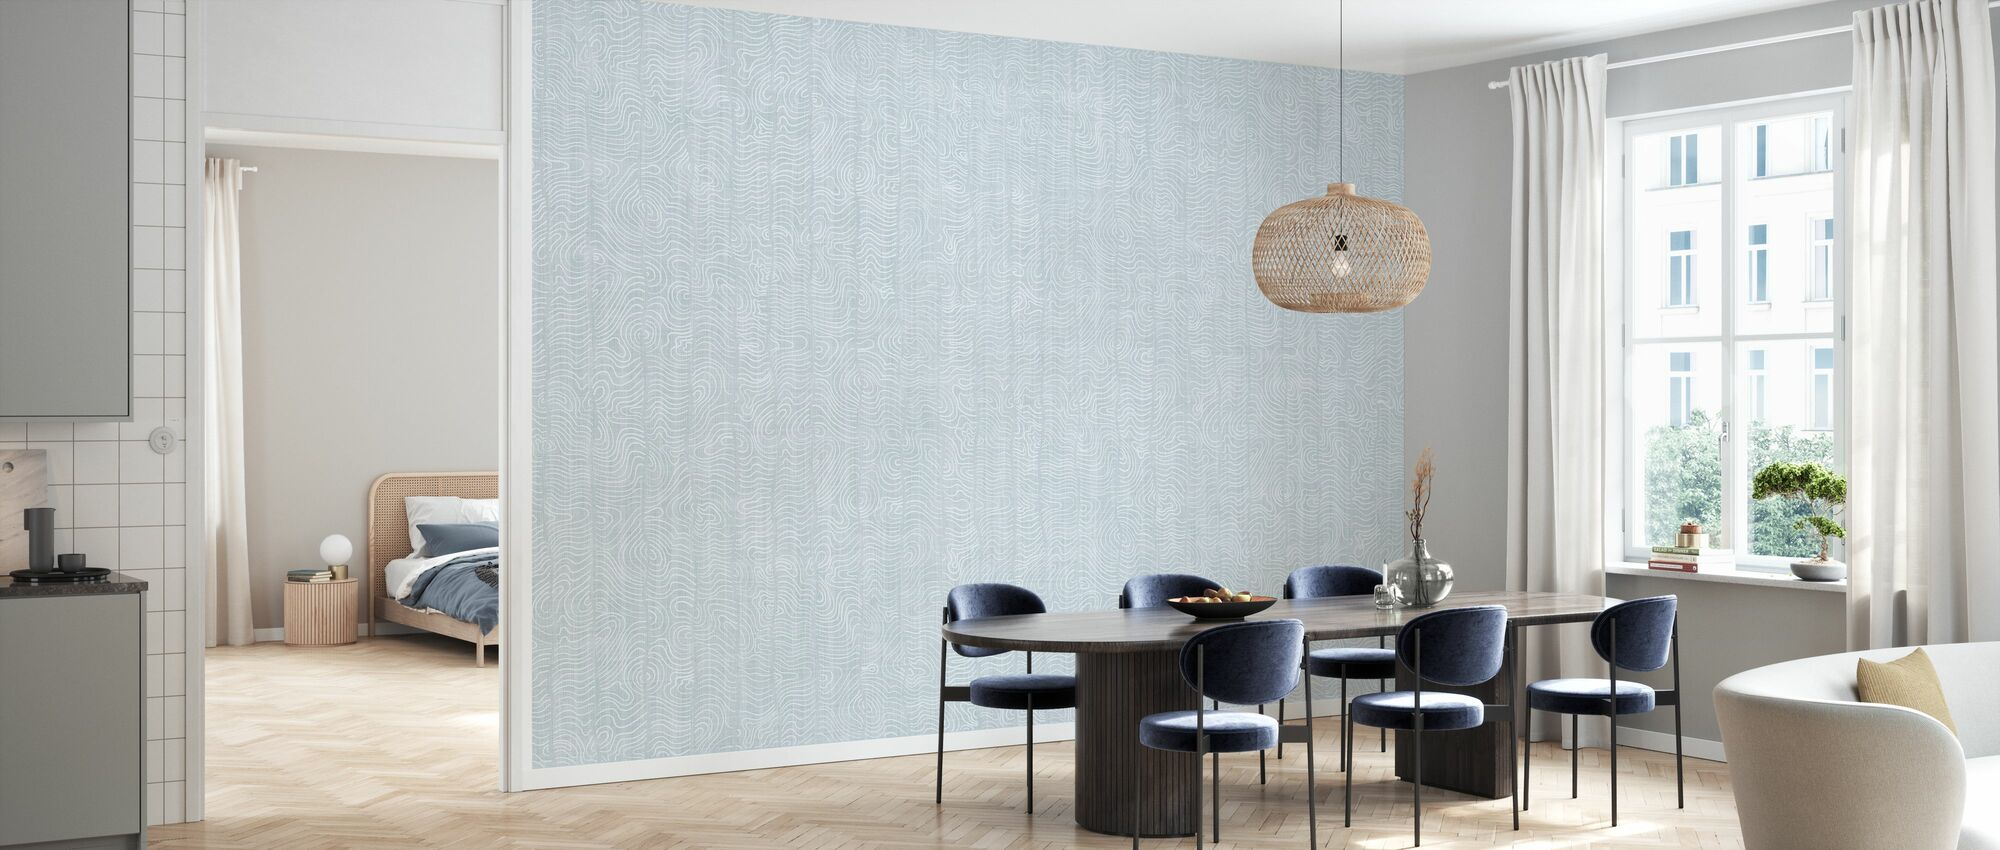 Nami - Real Duckegg - Wallpaper - Kitchen